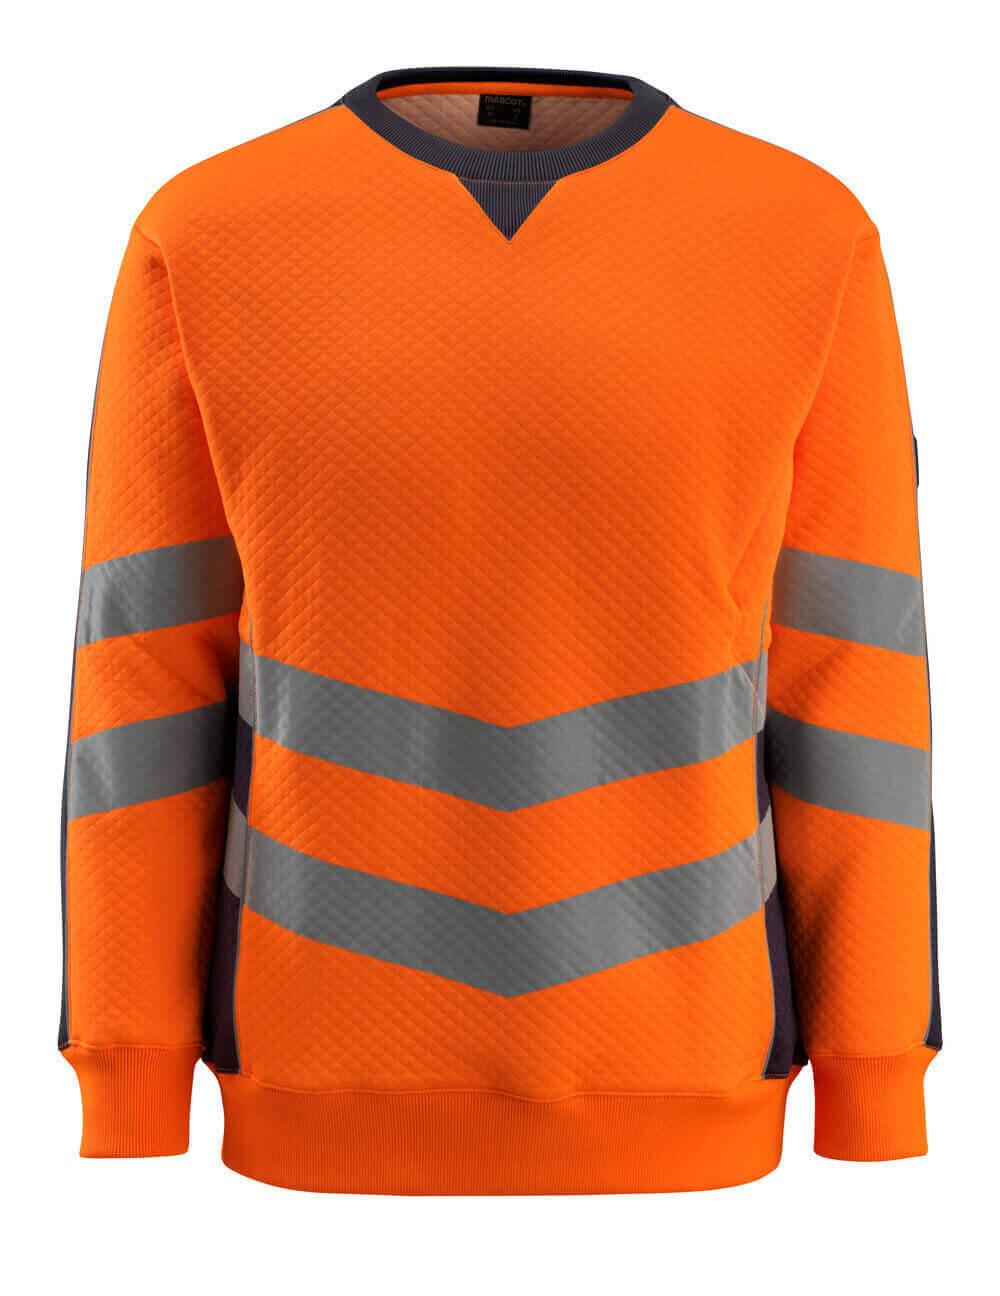 50126-932-14010 Sweatshirt - hi-vis orange/dark navy